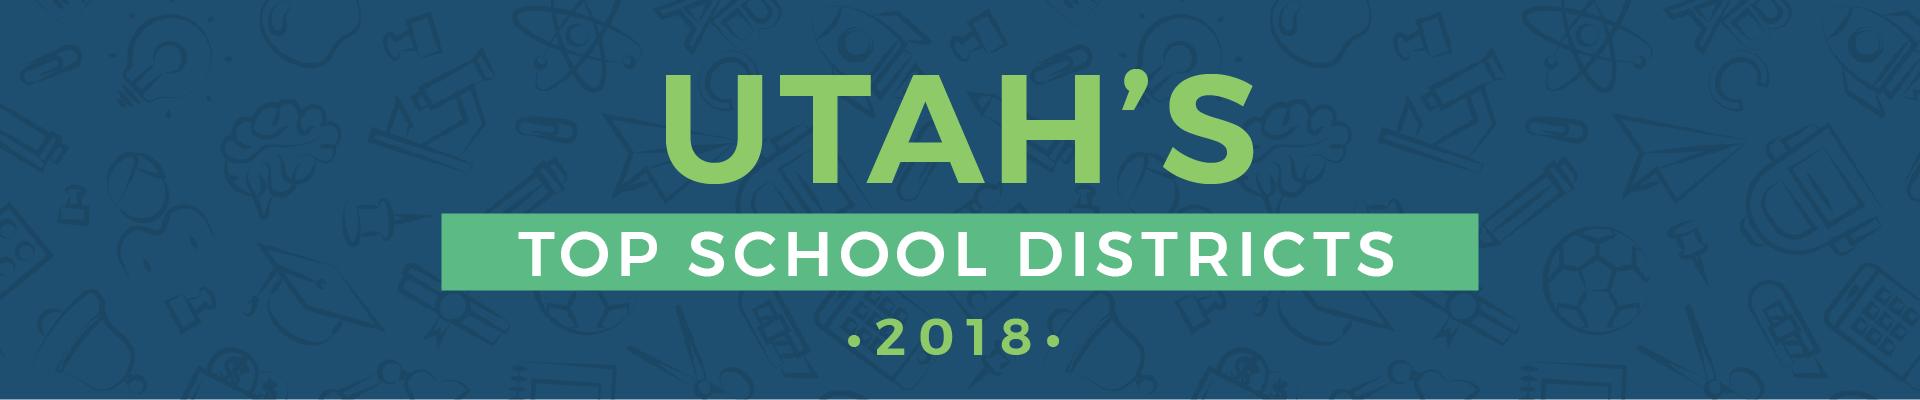 Top School Districts in Utah, 2018   BackgroundChecks.org